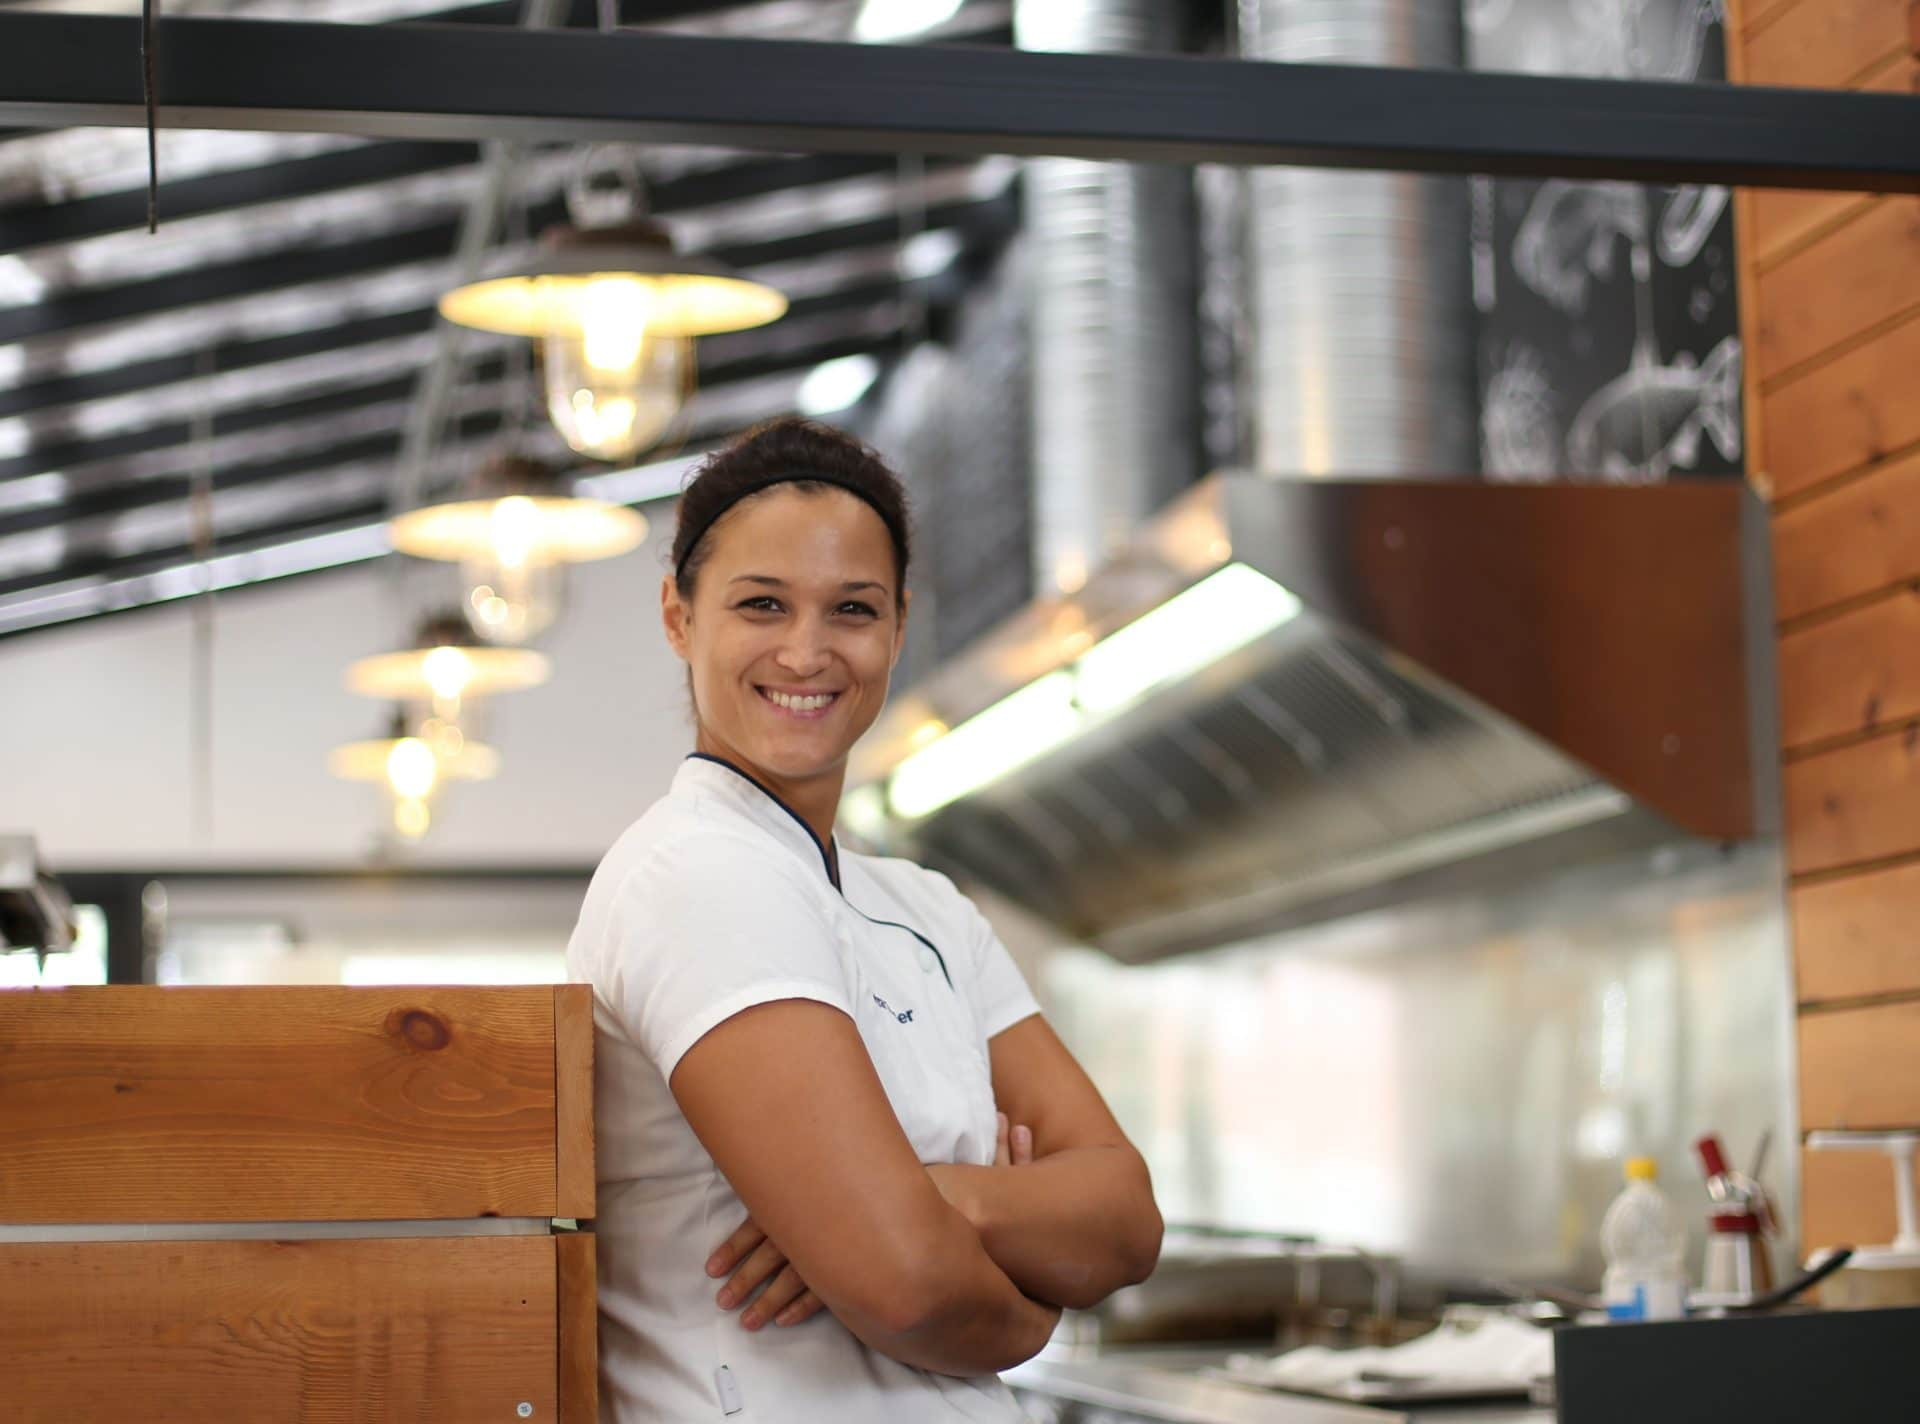 Főz, alkot, mesél, ragyog – Interjú Tischler Petrával - Dining Guide